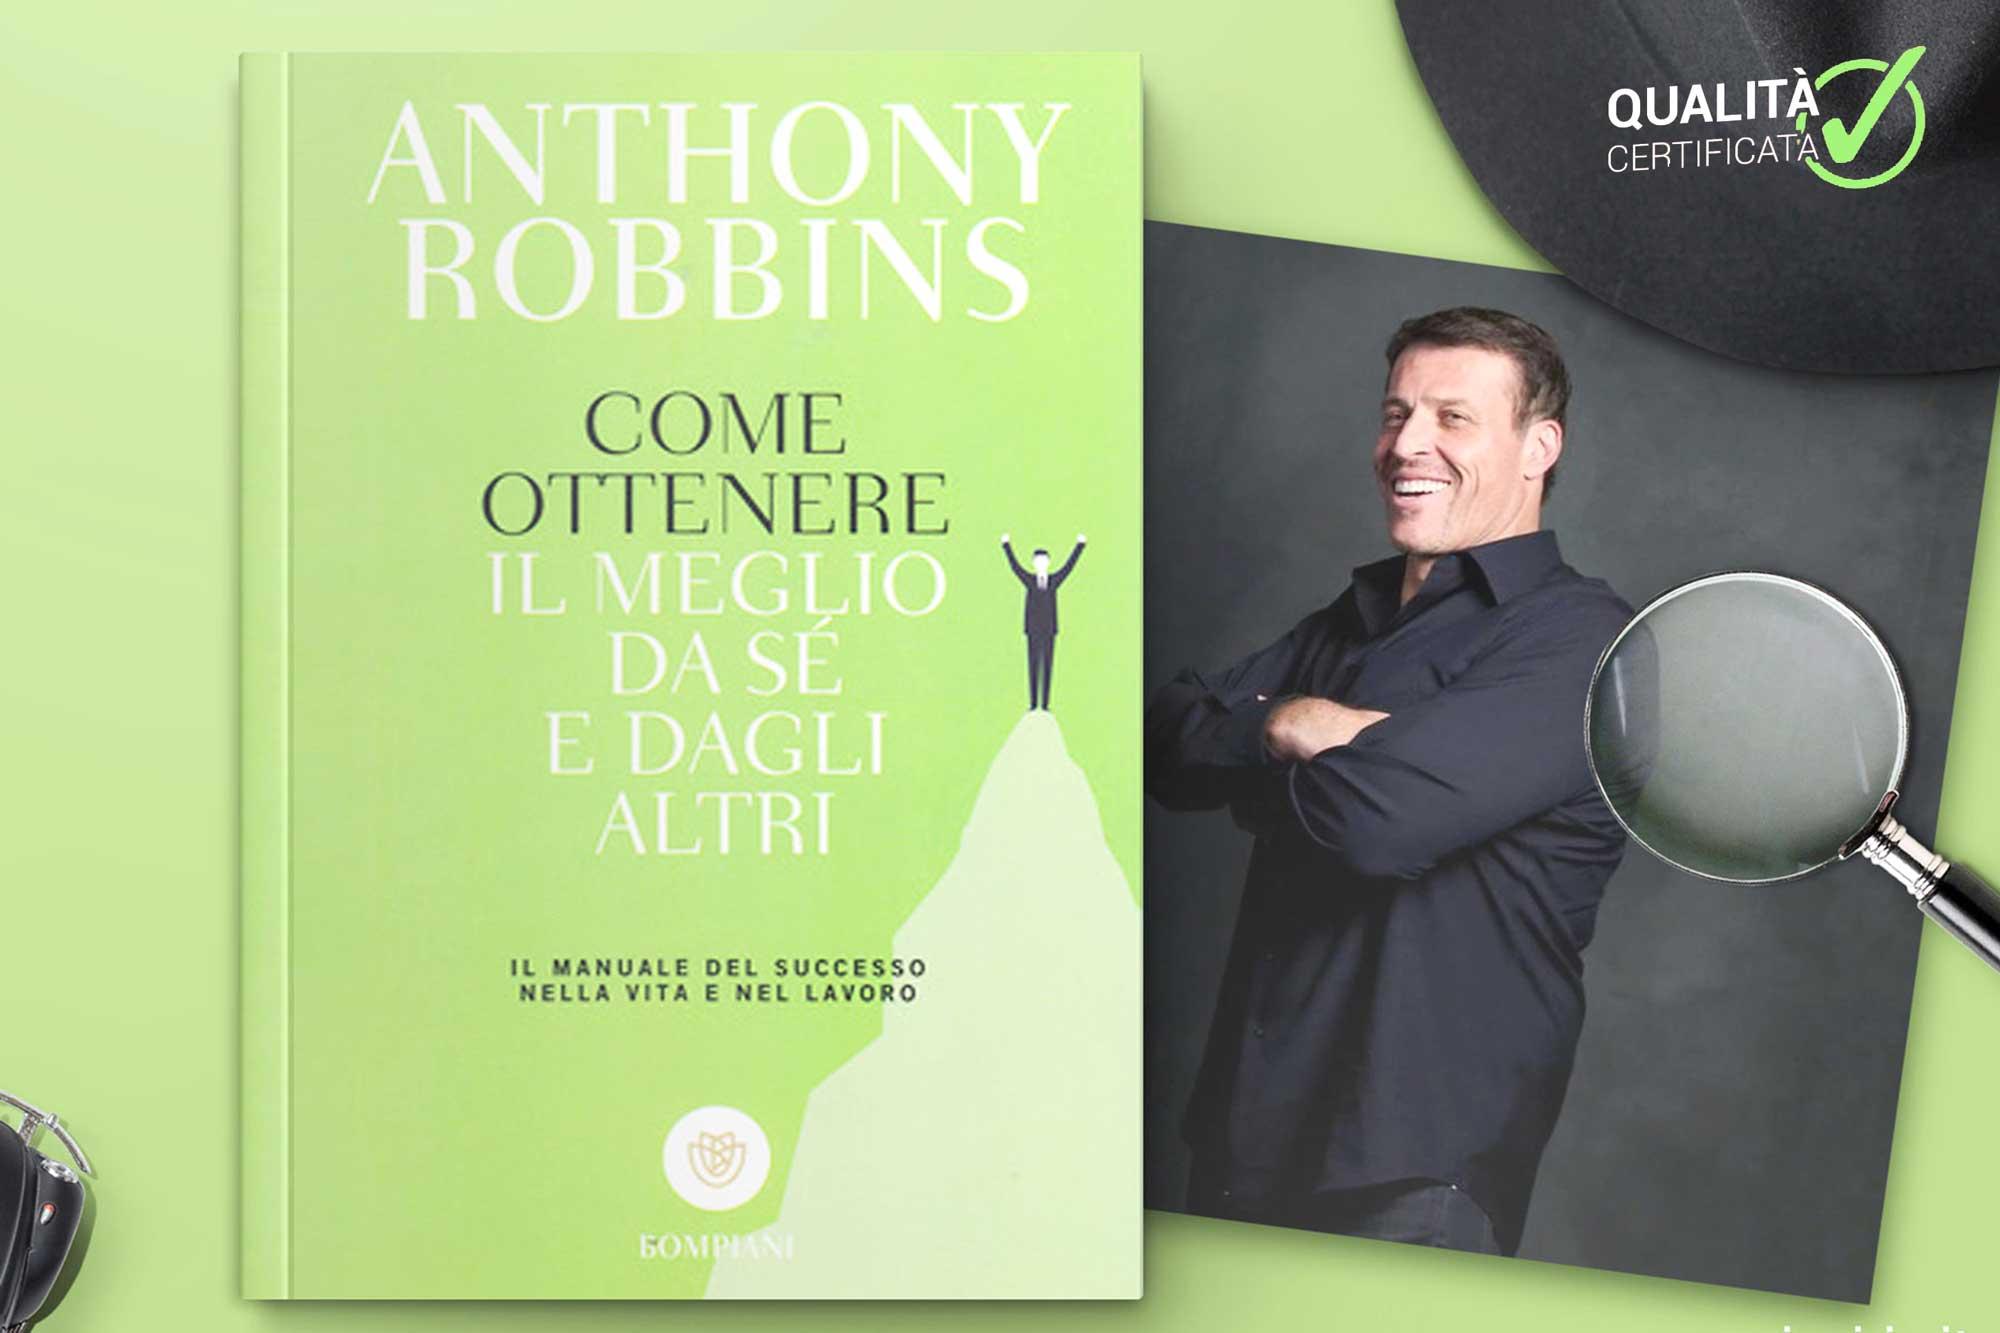 Anthony-robbins-tony-libro-autostima